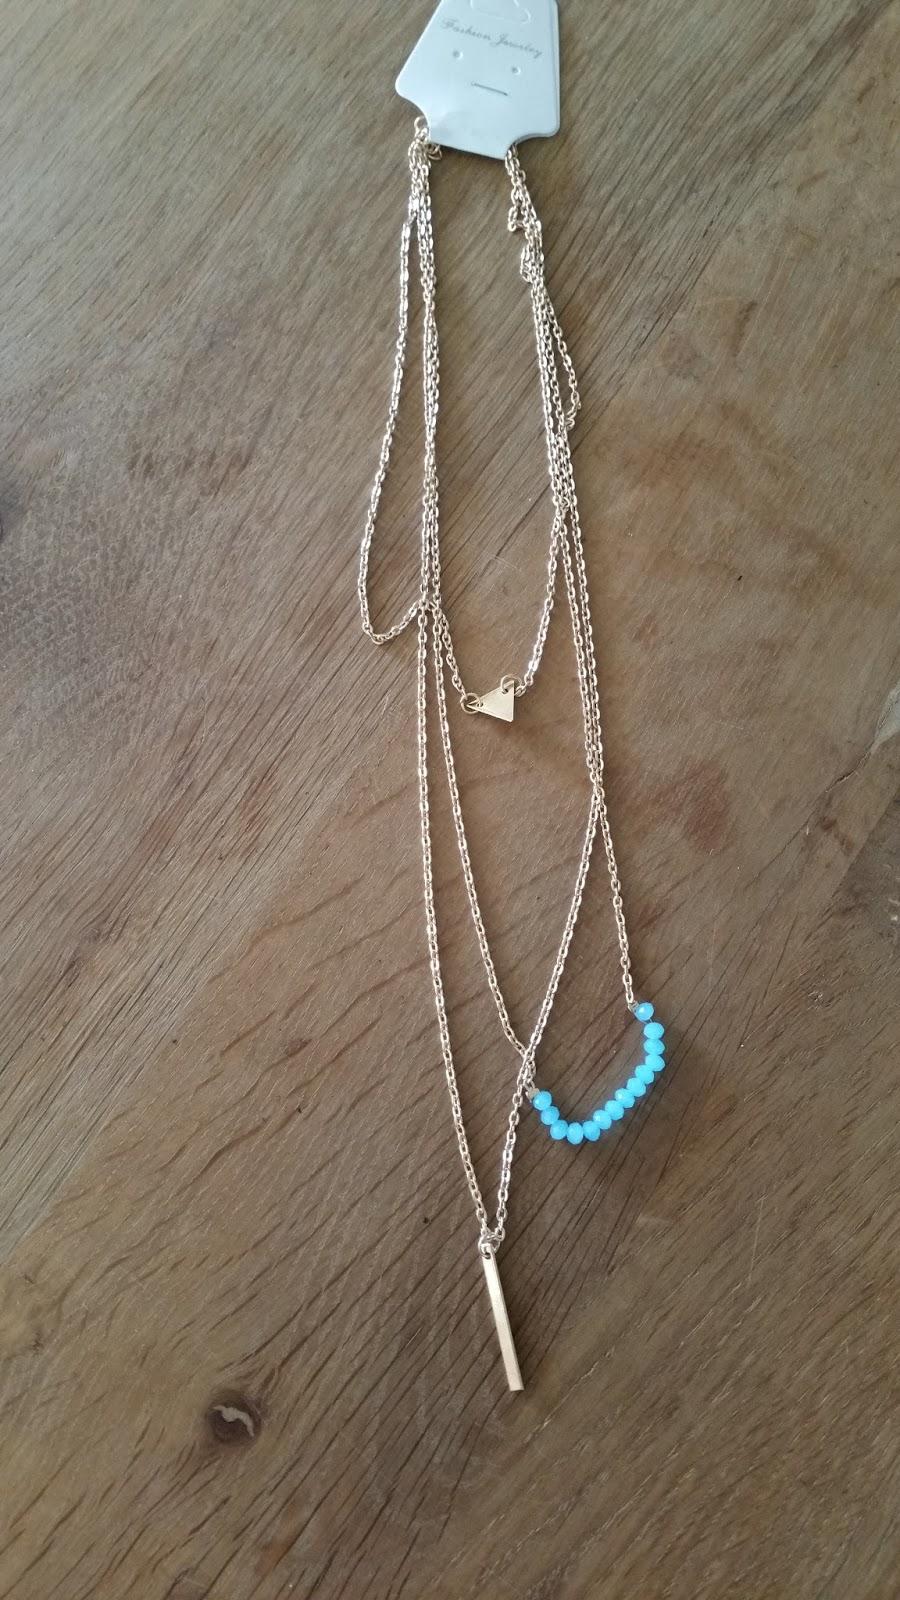 Shopping haul series #2: Zaful minimal necklace